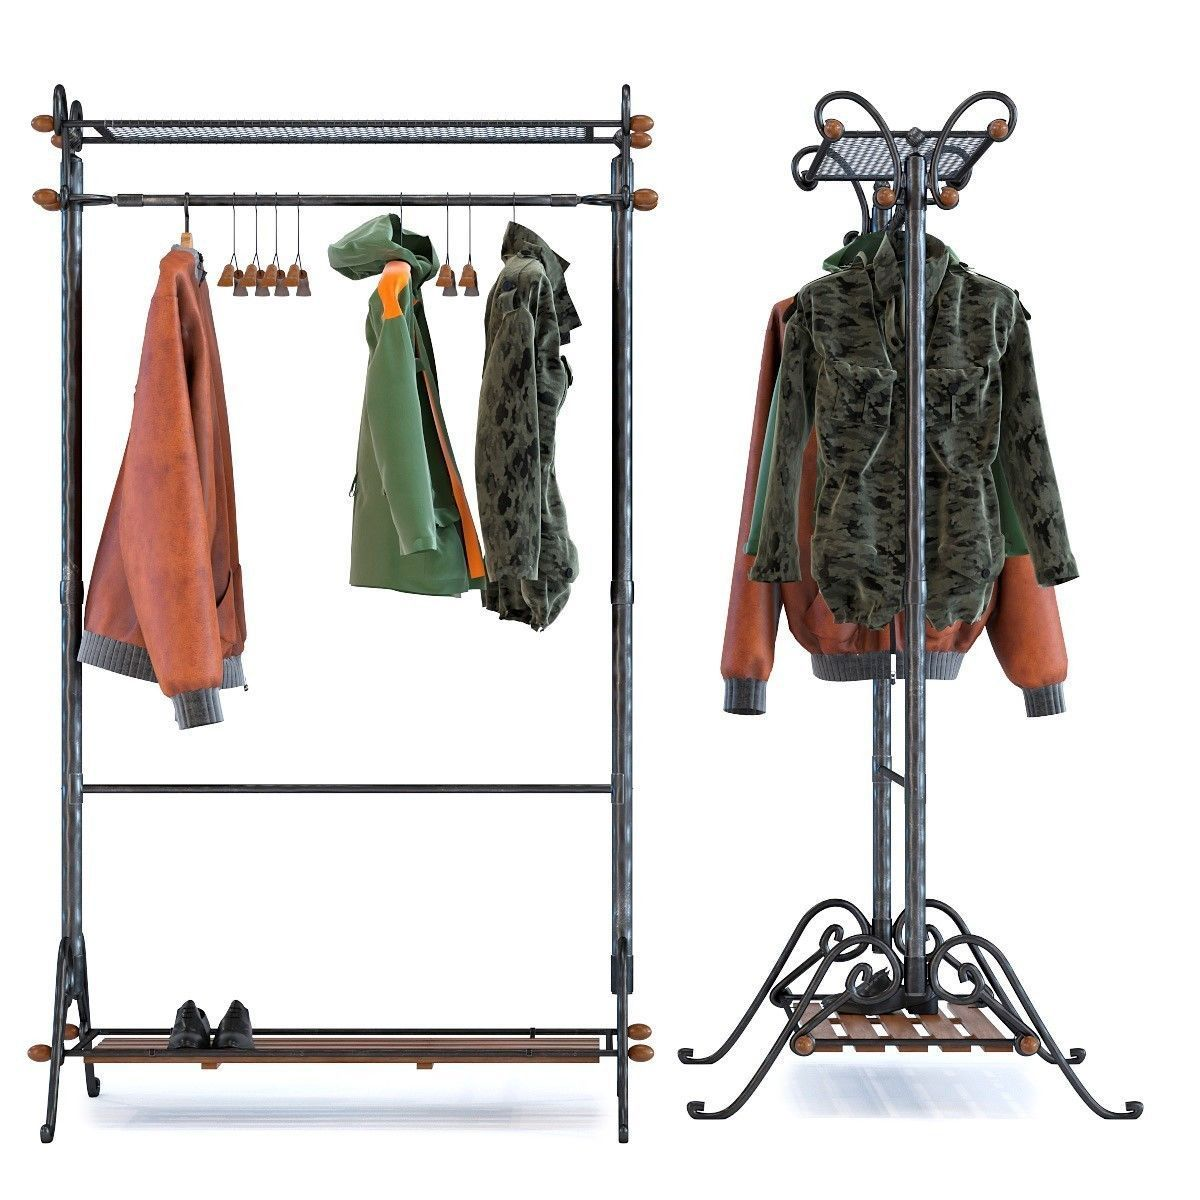 Clothing Rack Cosmopolitan